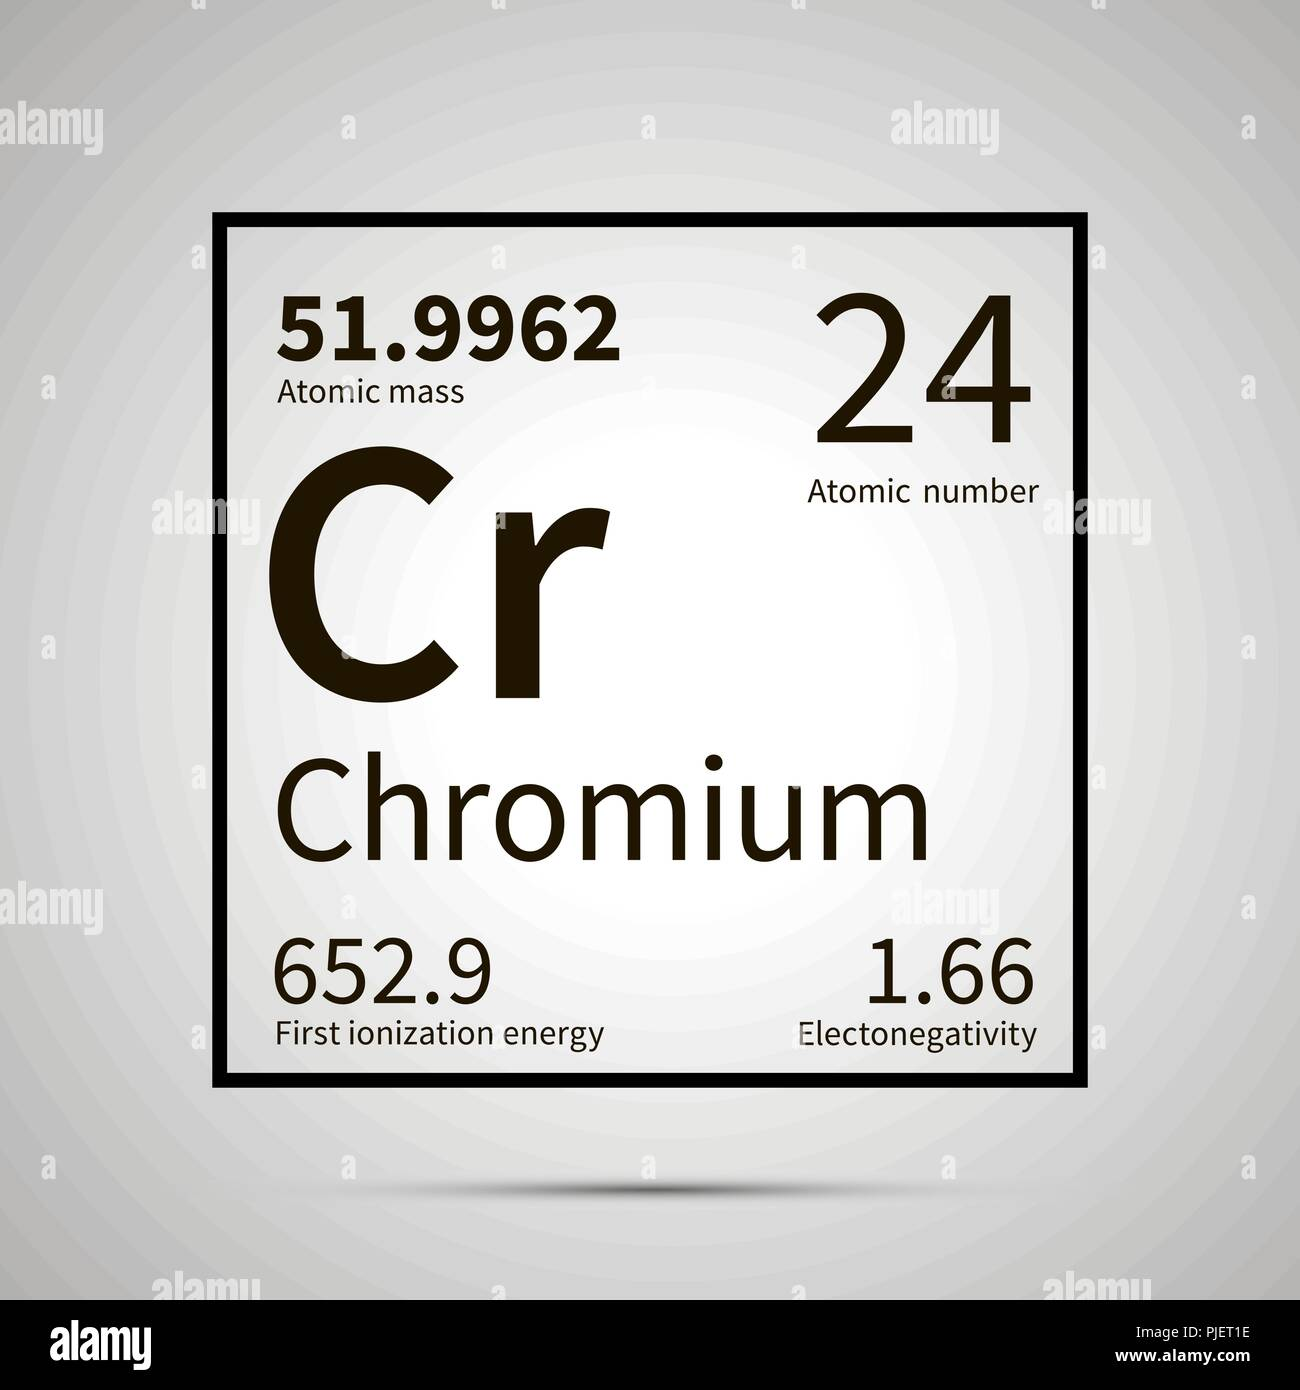 Chlorine Element Stock Photos Amp Chlorine Element Stock